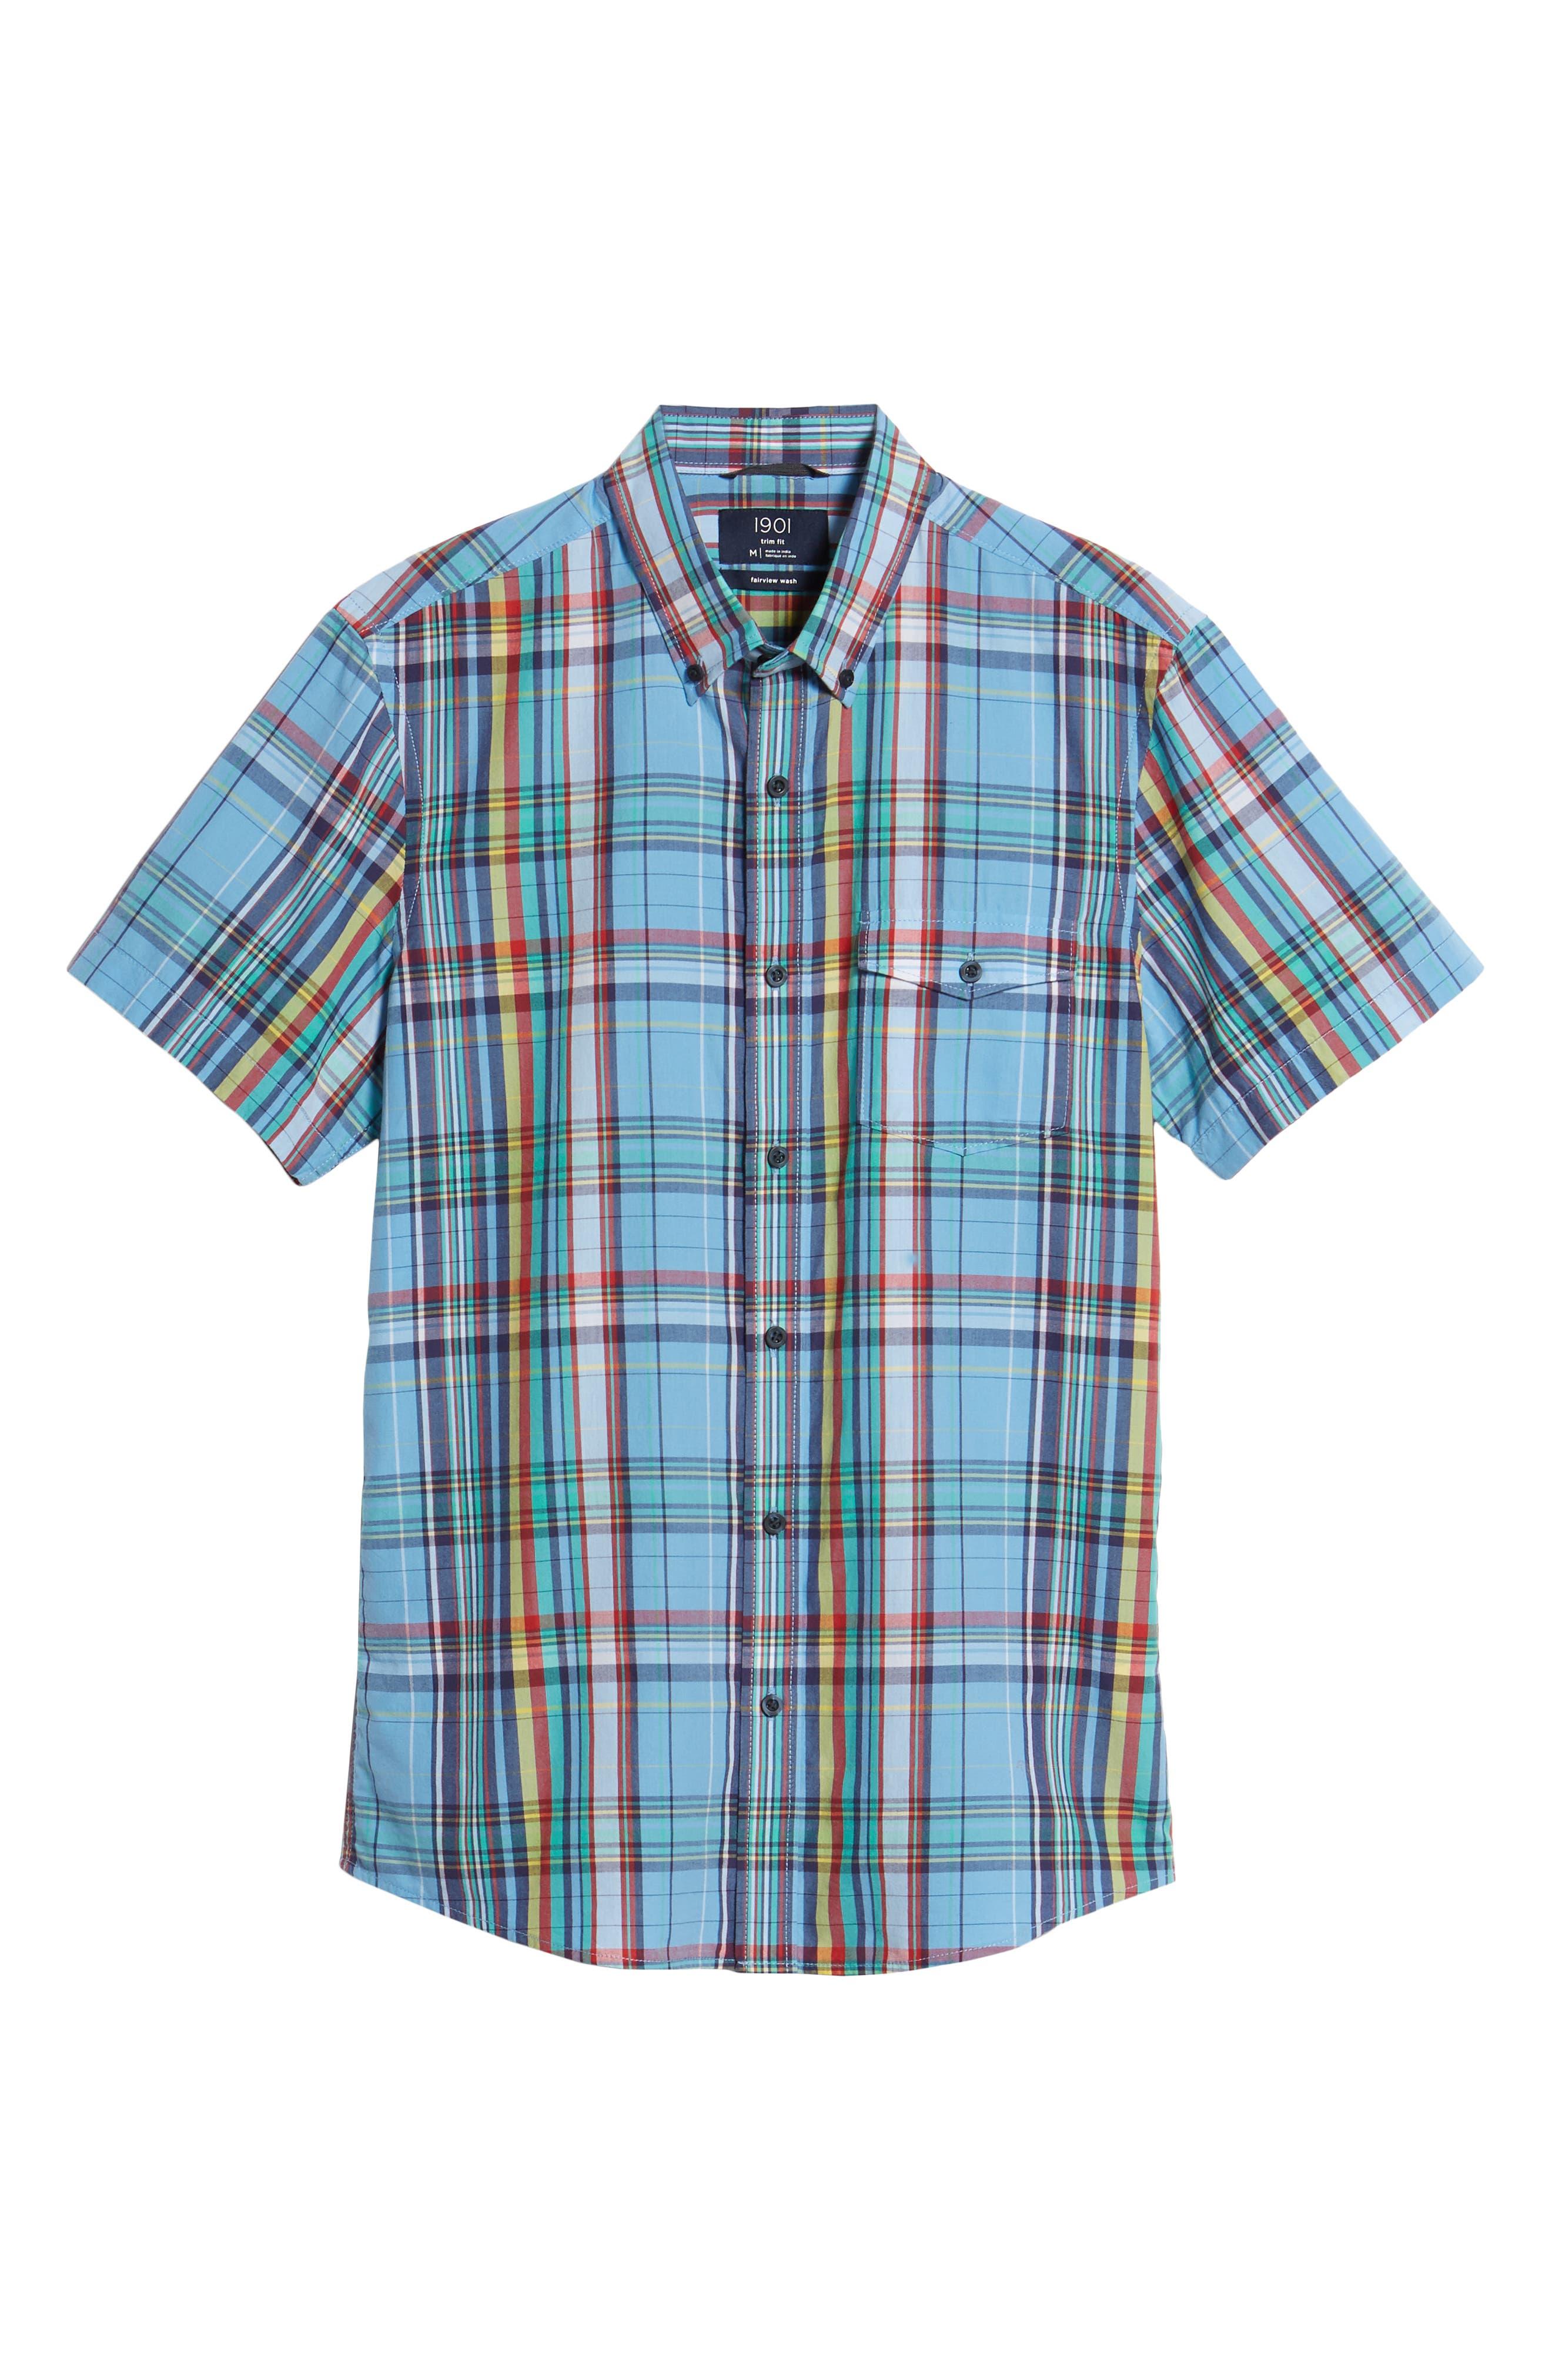 Ivy Trim Fit Madras Plaid Sport Shirt,                             Alternate thumbnail 6, color,                             Blue Chambray Multi Plaid